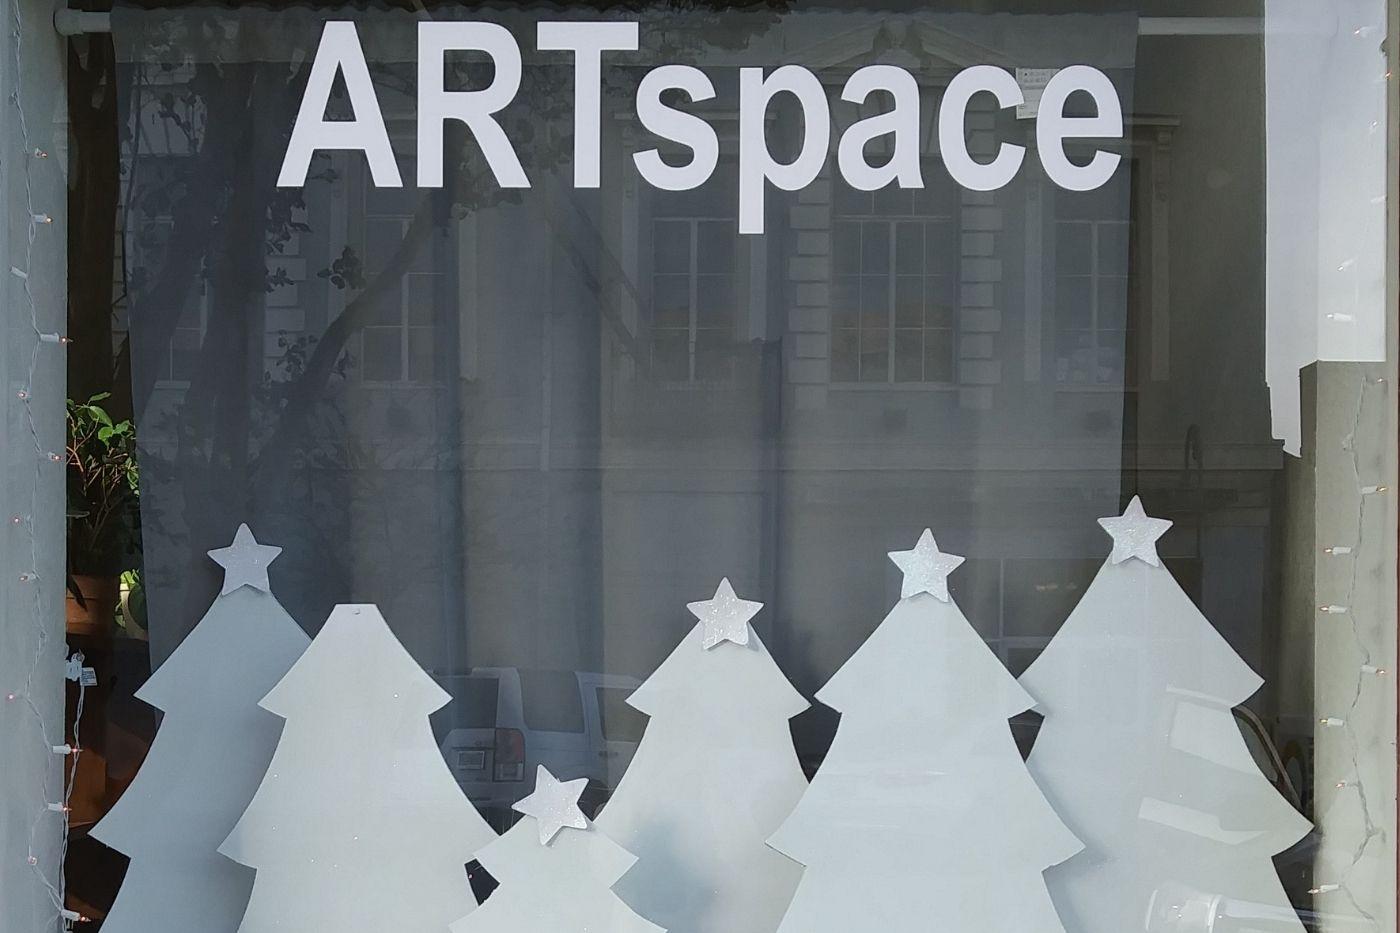 ARTspace Winter Windows